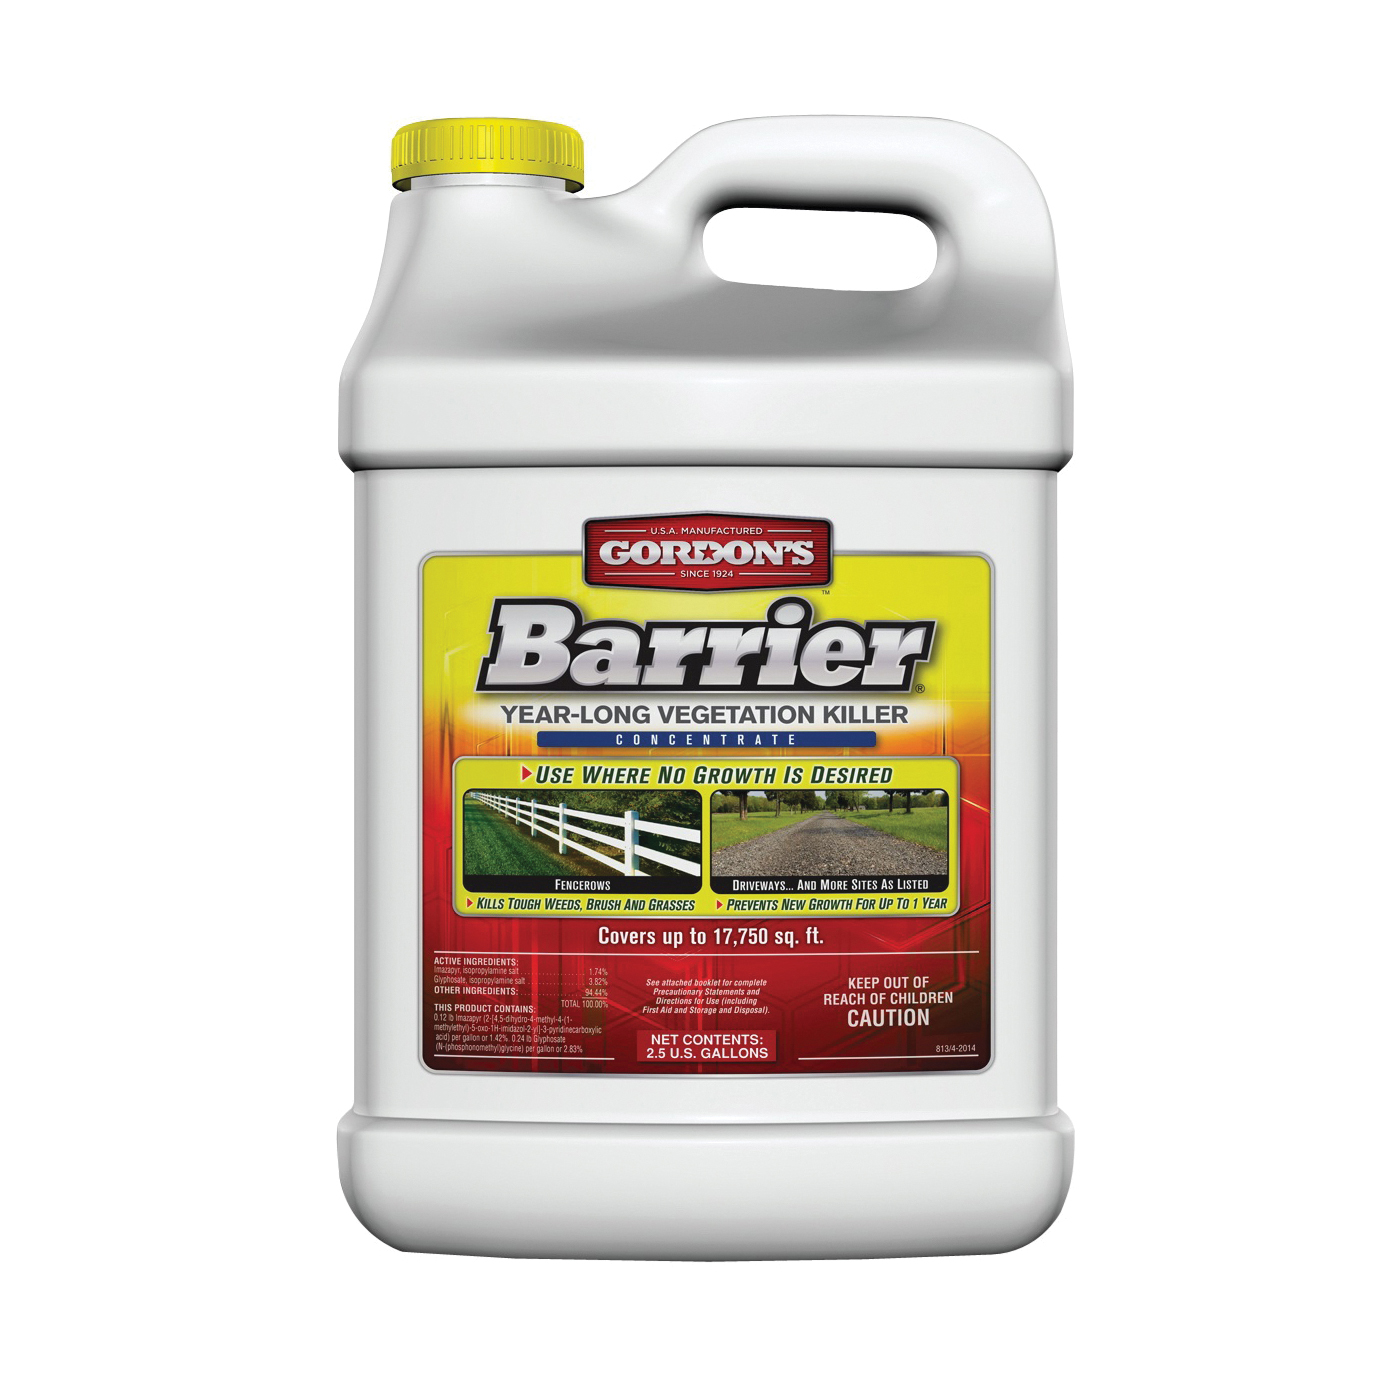 Picture of Gordon's Barrier 8131122 Vegetation Killer, Liquid, Light Yellow, 2.5 gal Package